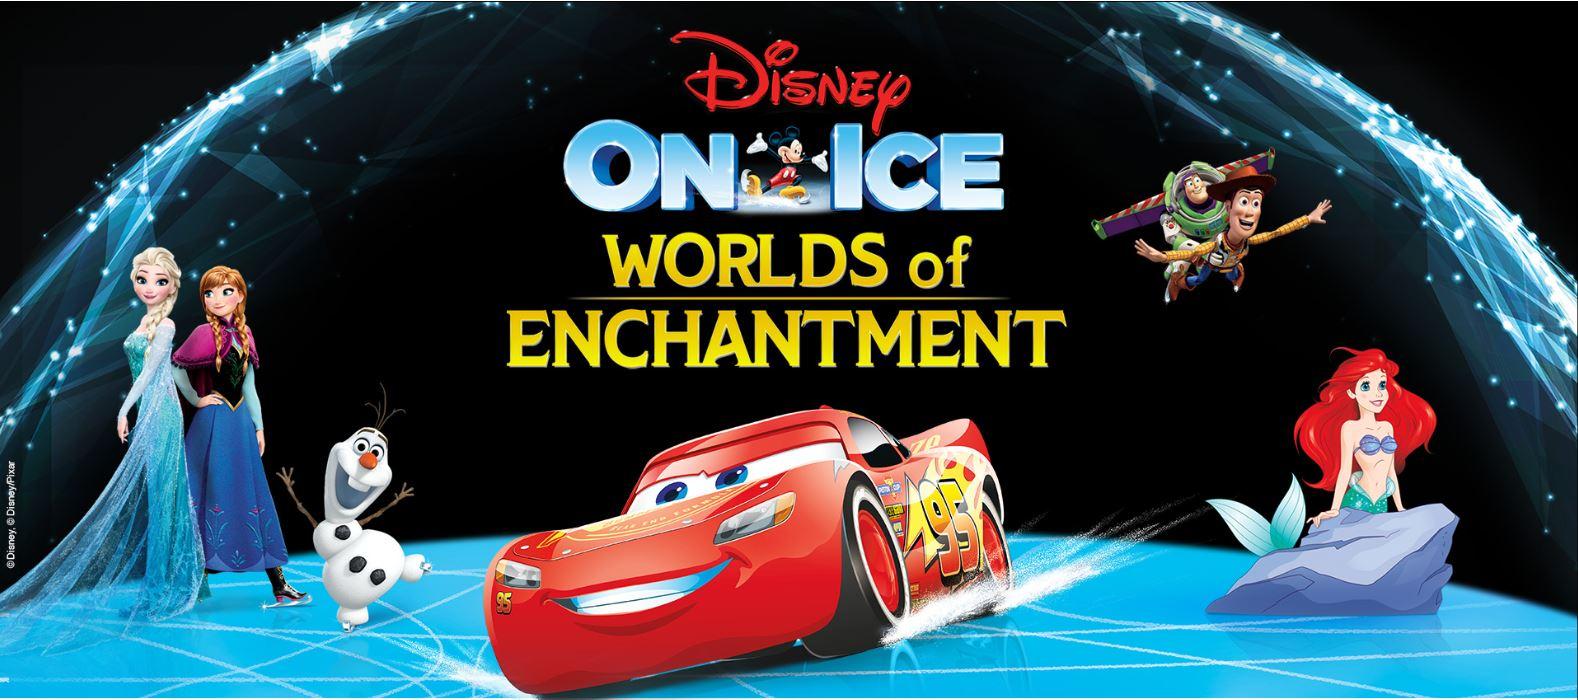 Disney On Ice logo_1557849001743.JPG.jpg